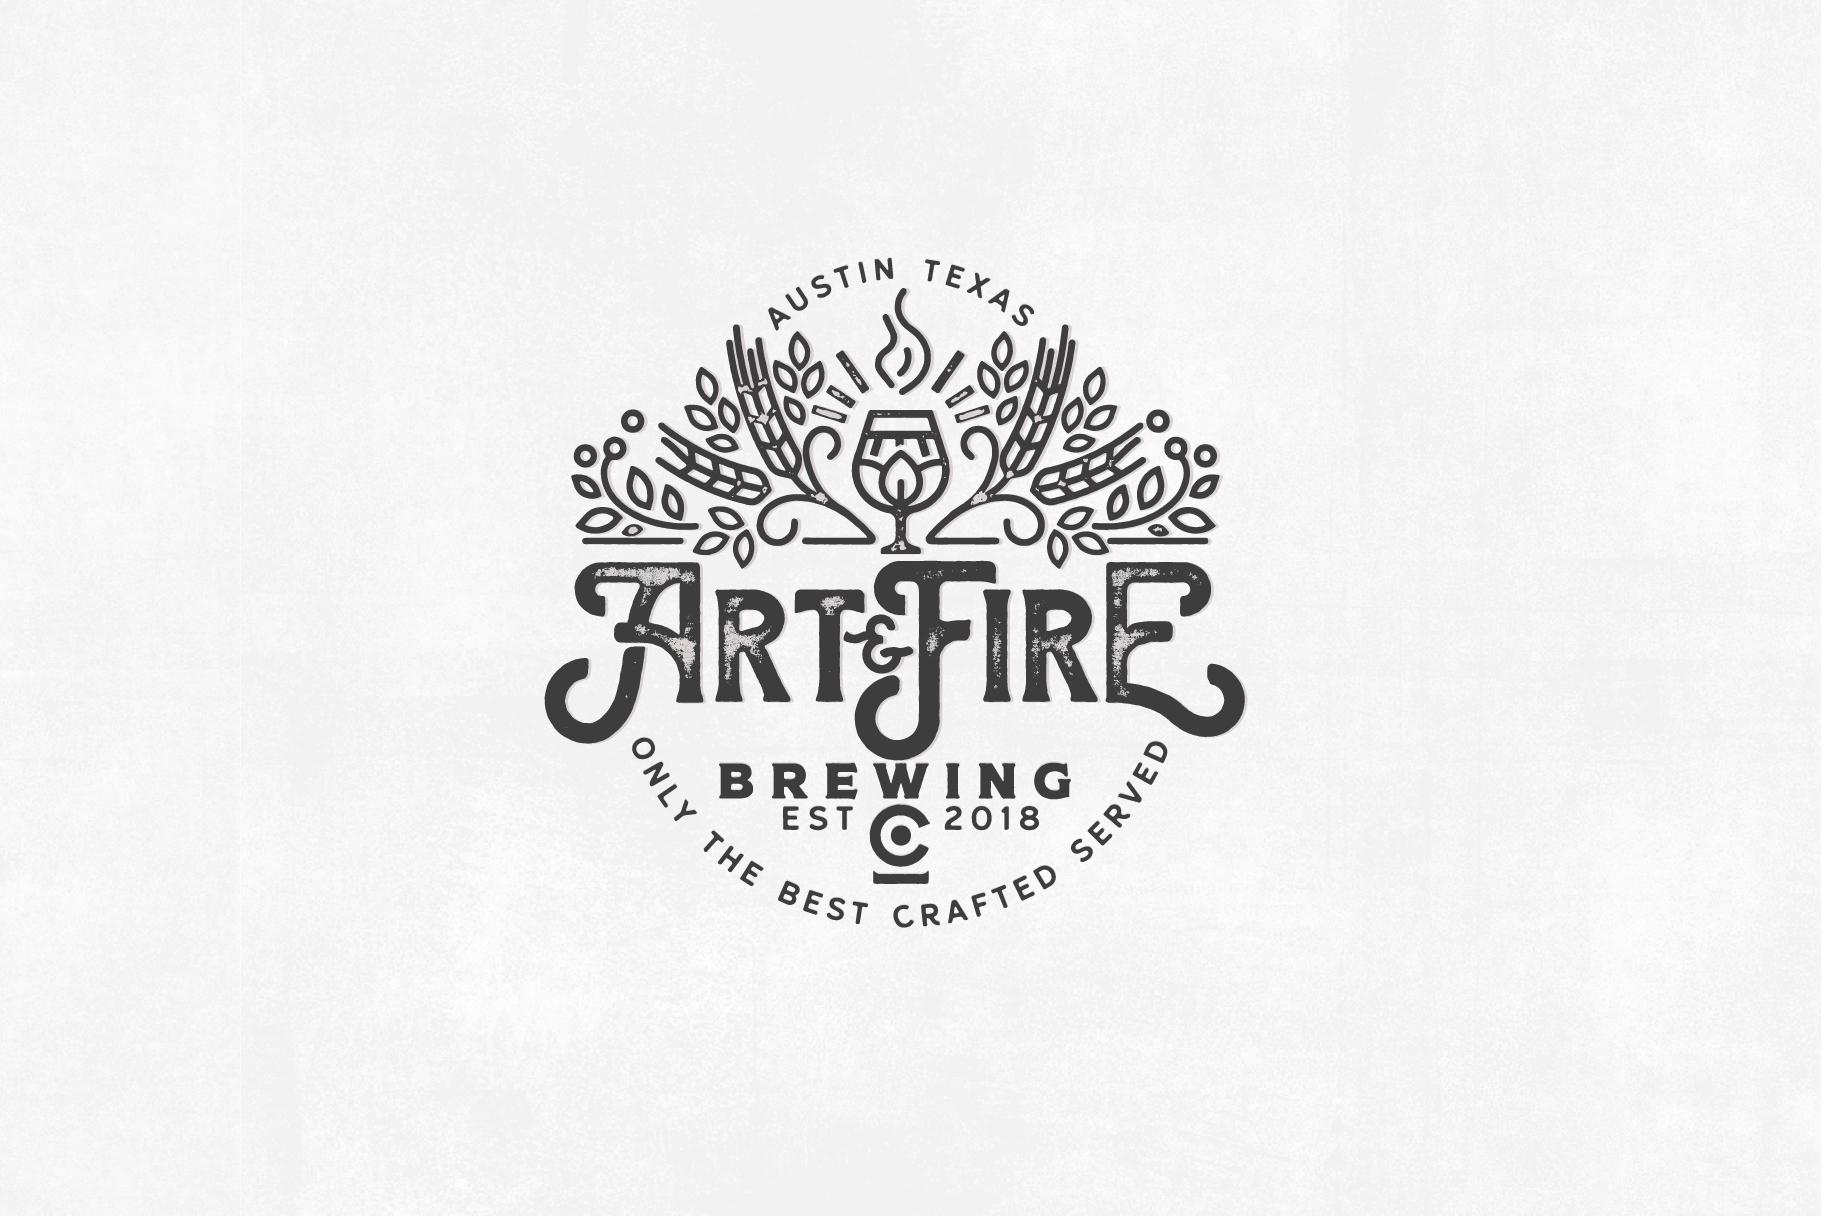 Brewski - Brewery Typeface example image 4